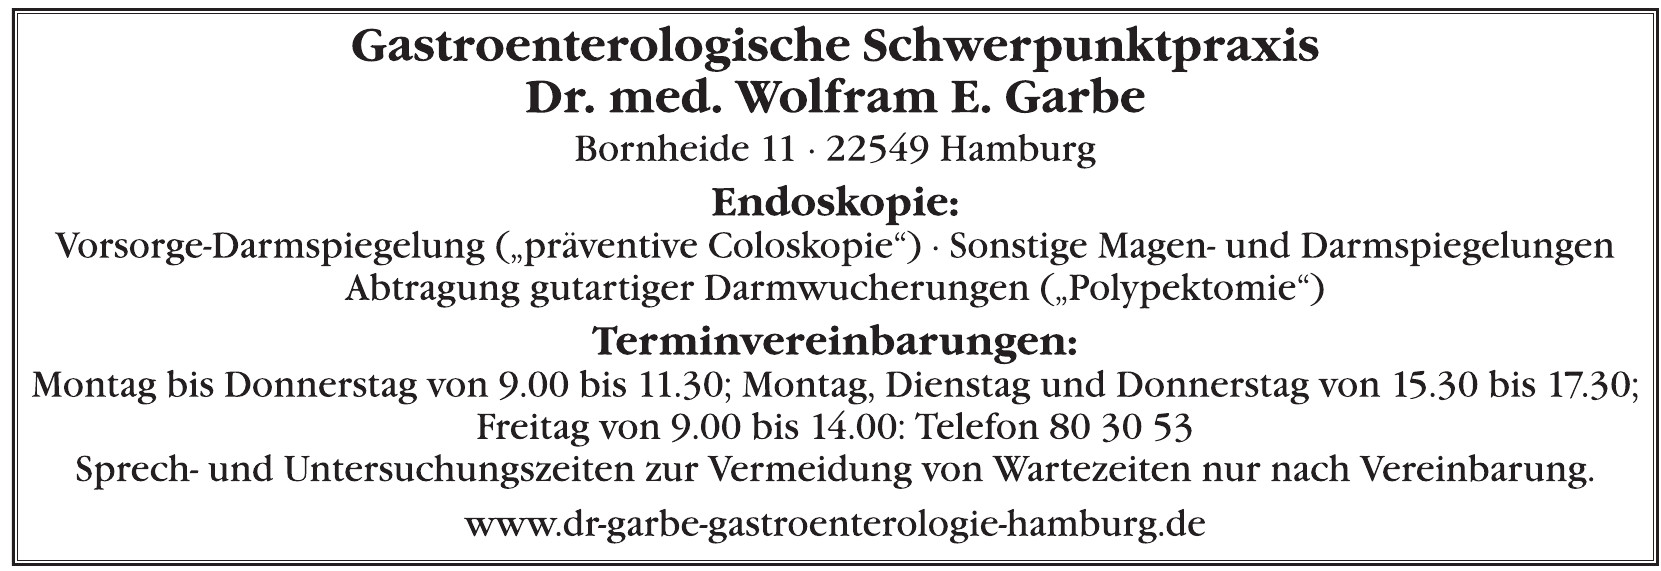 Gastroenterologische Schwerpunktpraxis Dr. med. Wolfram E. Garbe